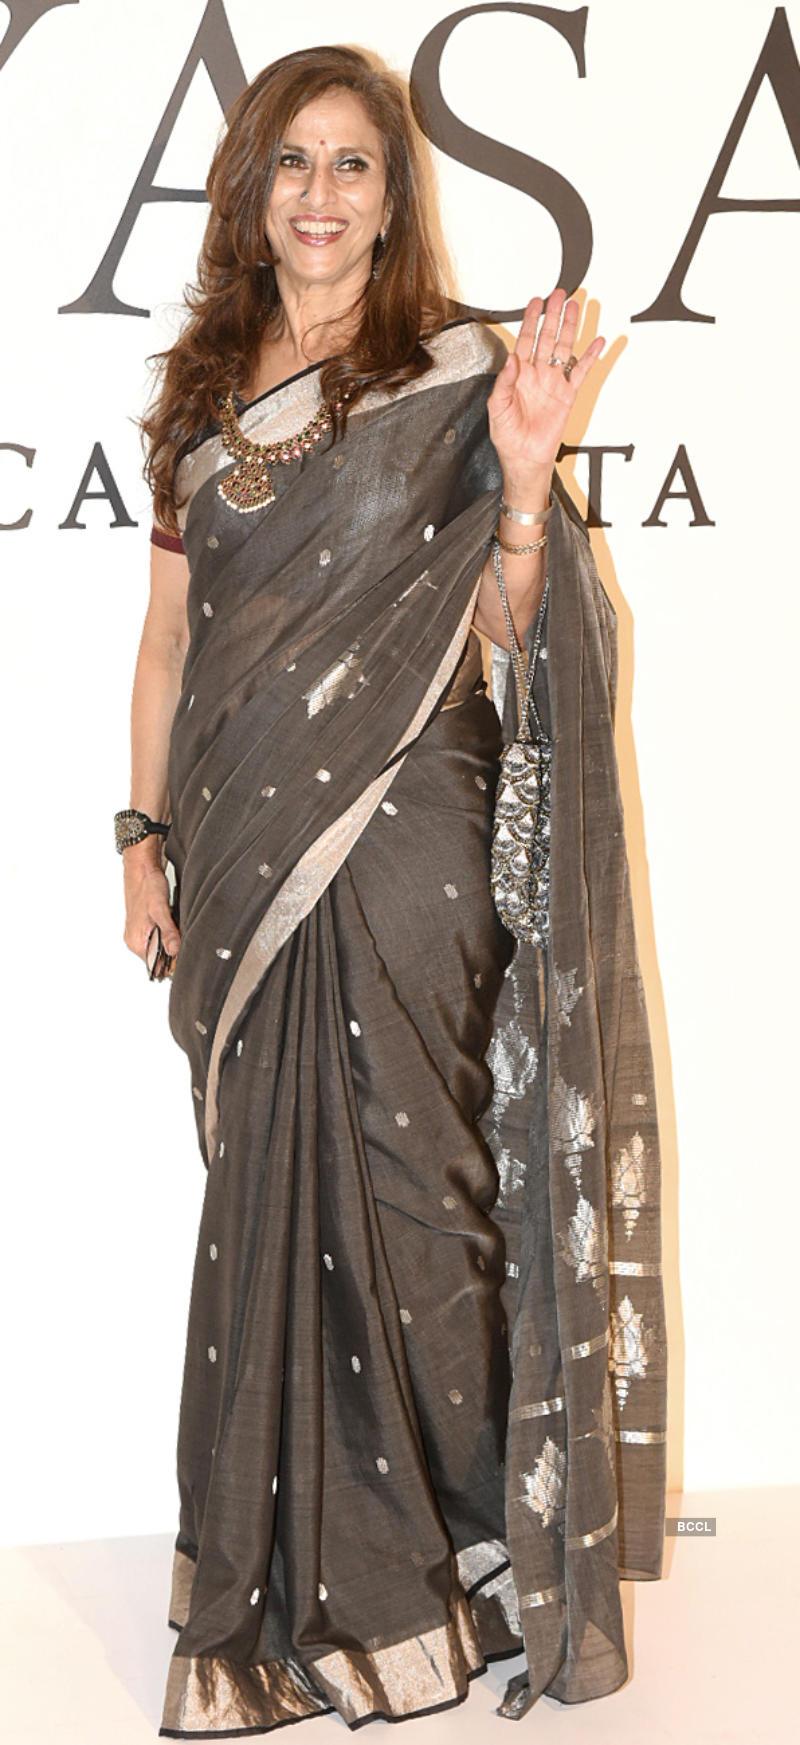 Bollywood divas glam-up the 20 years celebration of Sabyasachi Mukherjee in fashion industry